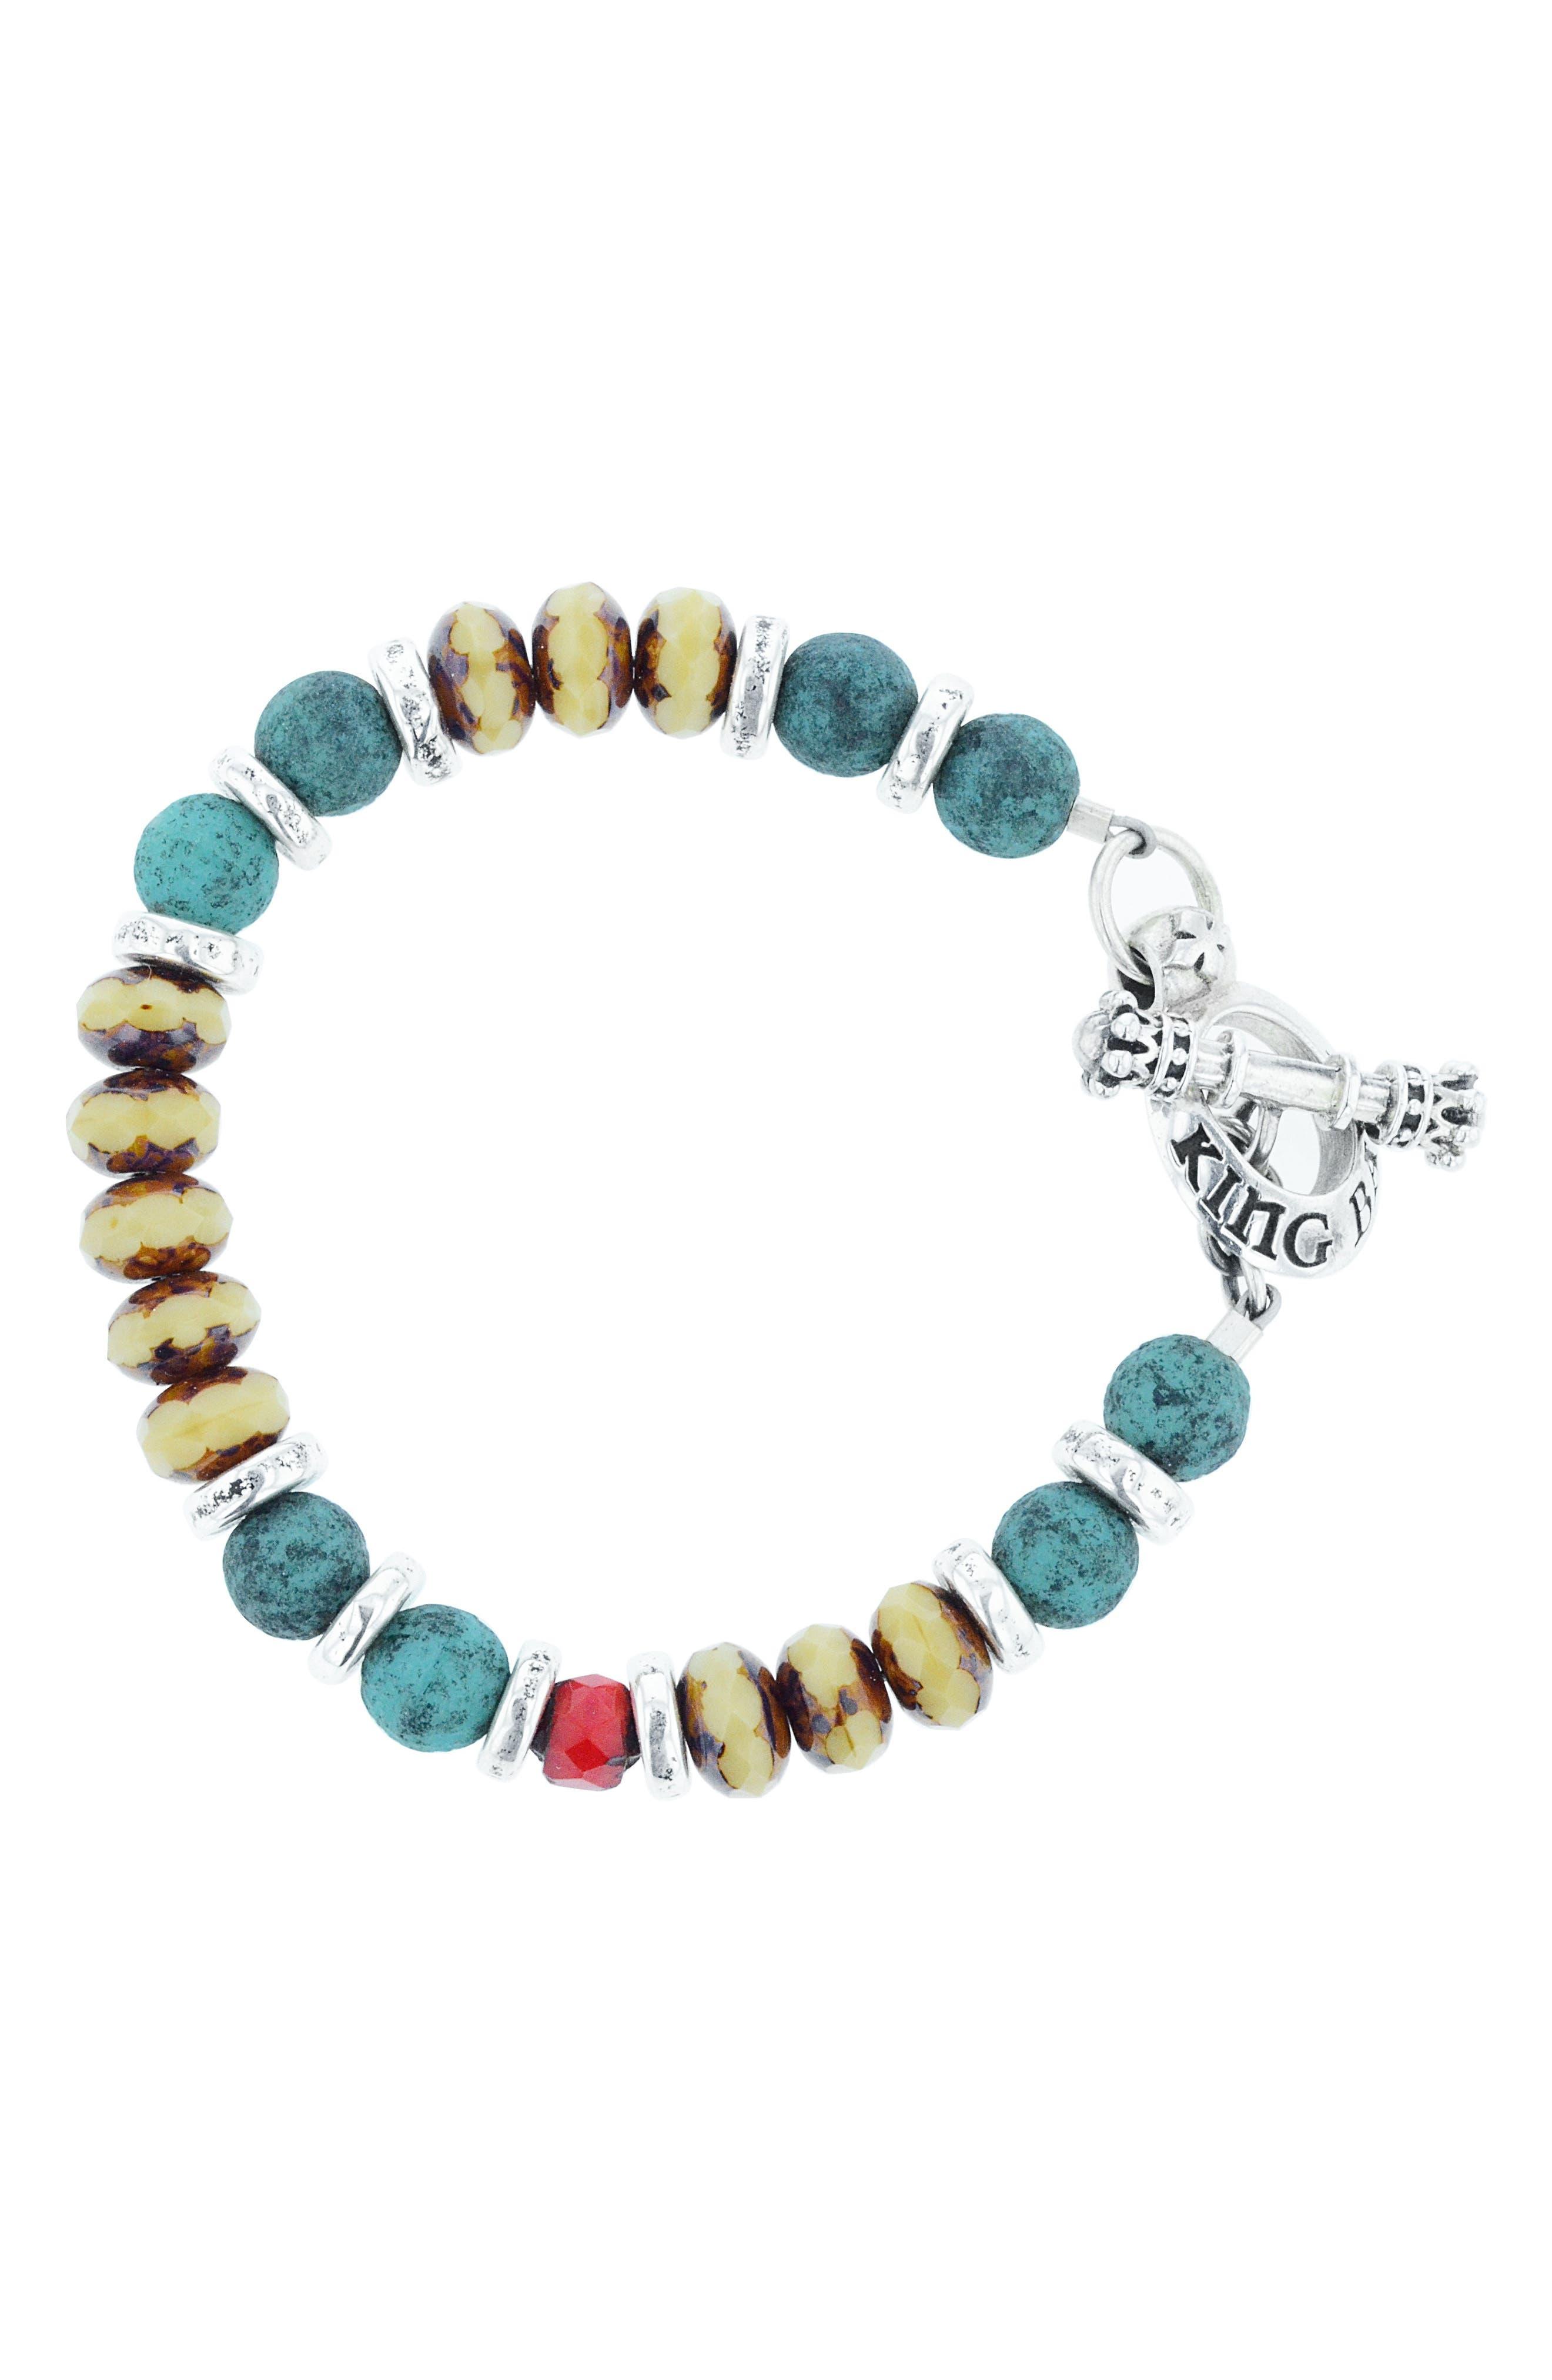 American Voices Ceramic & Glass Bead Bracelet,                         Main,                         color, TURQUOISE